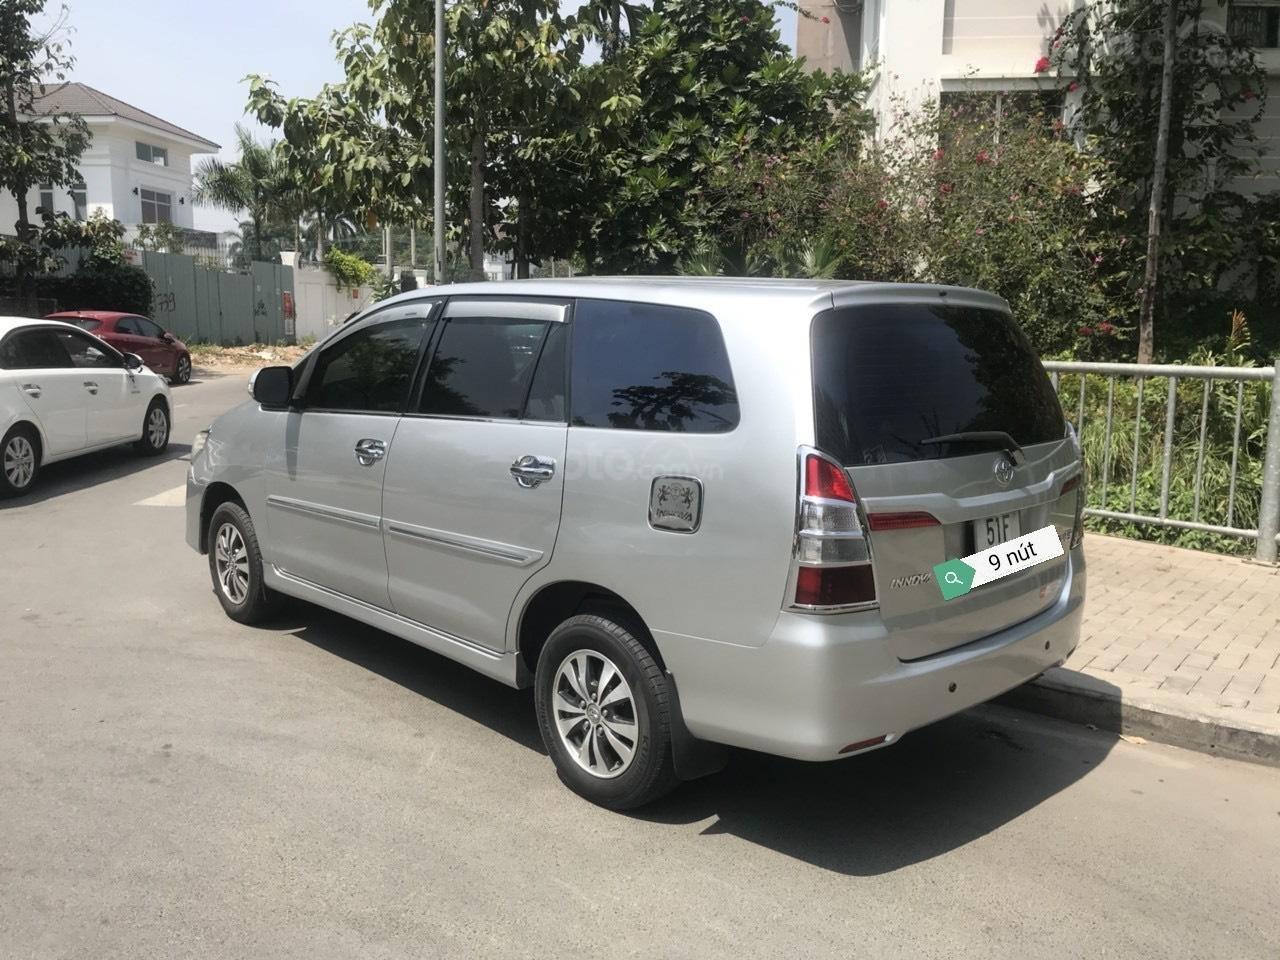 Chính chủ cần bán Toyota Innova đời 2015 (2)